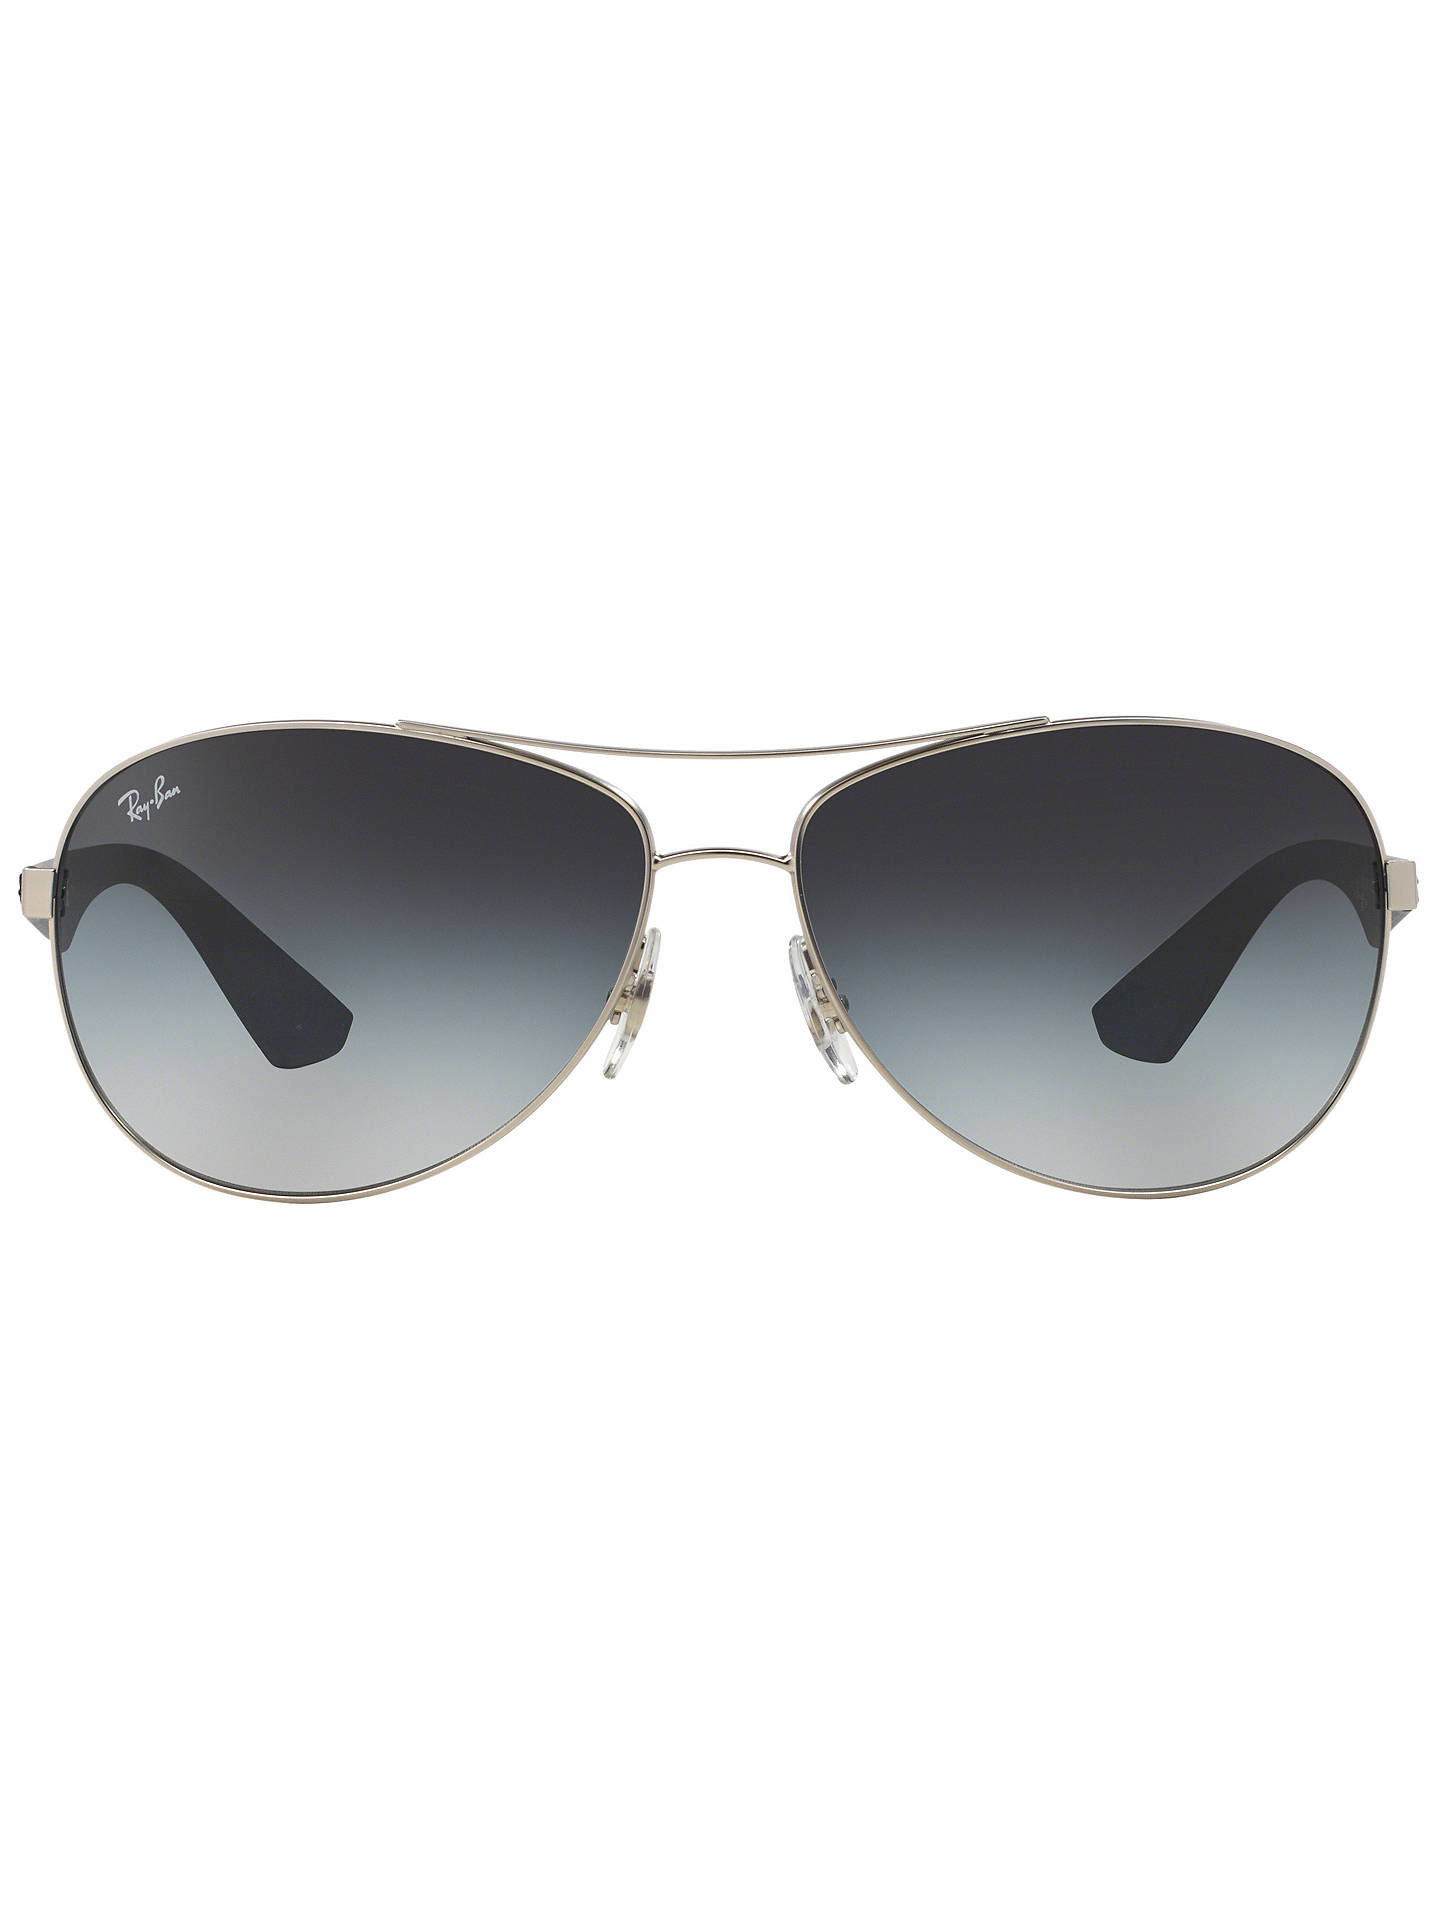 c9ff15aa61 ... Buy Ray-Ban RB3526 Metal Framed Pilot Sunglasses